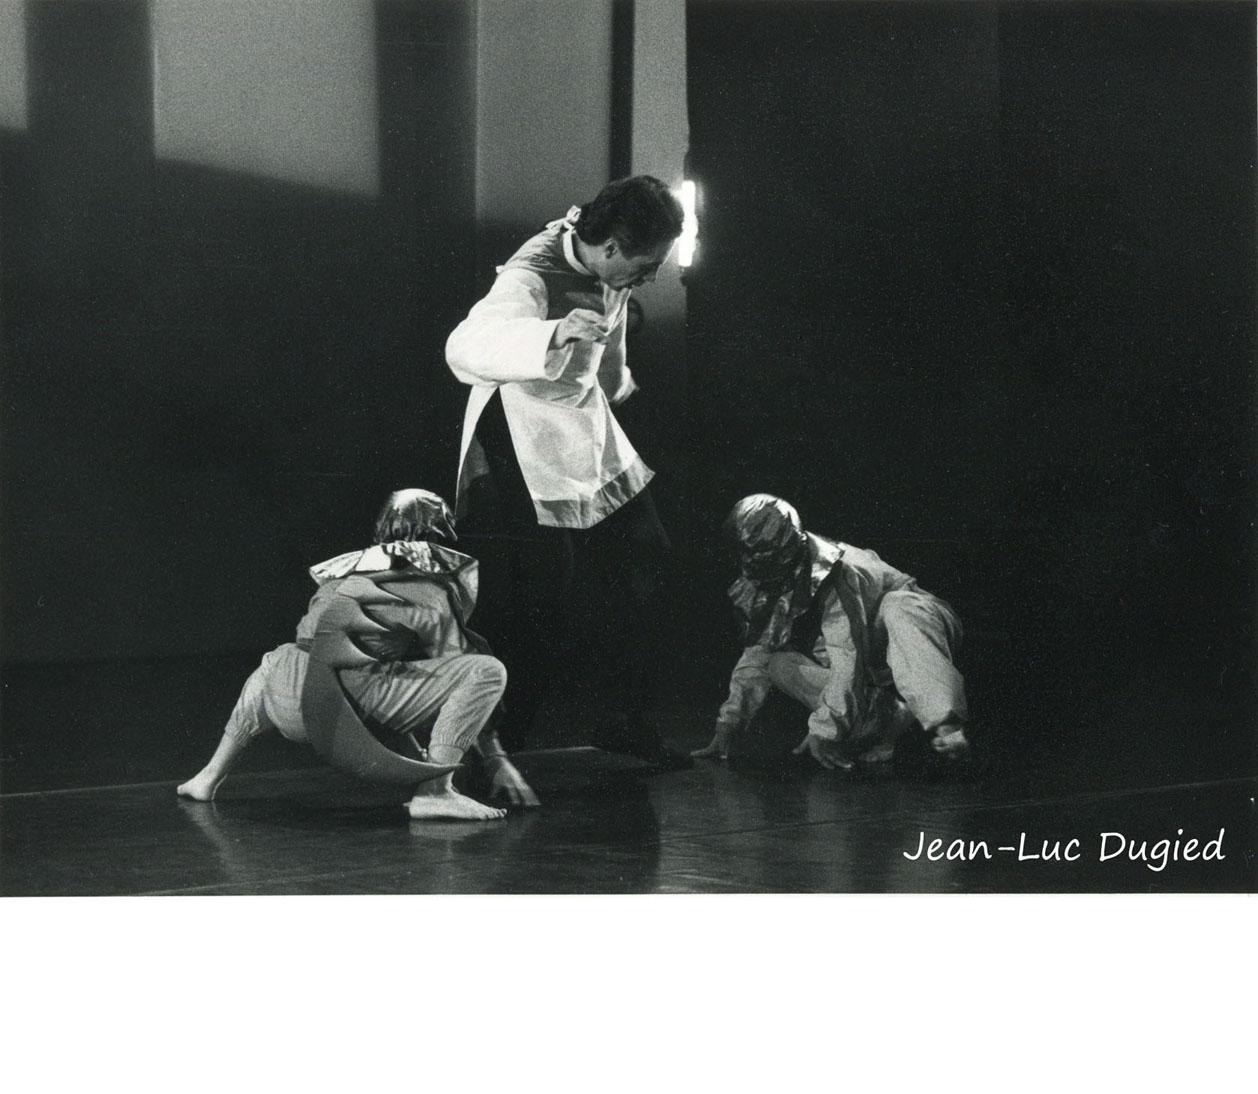 44 Witzman-Anaya Alejandro - 2010 personnages à danser - 1988